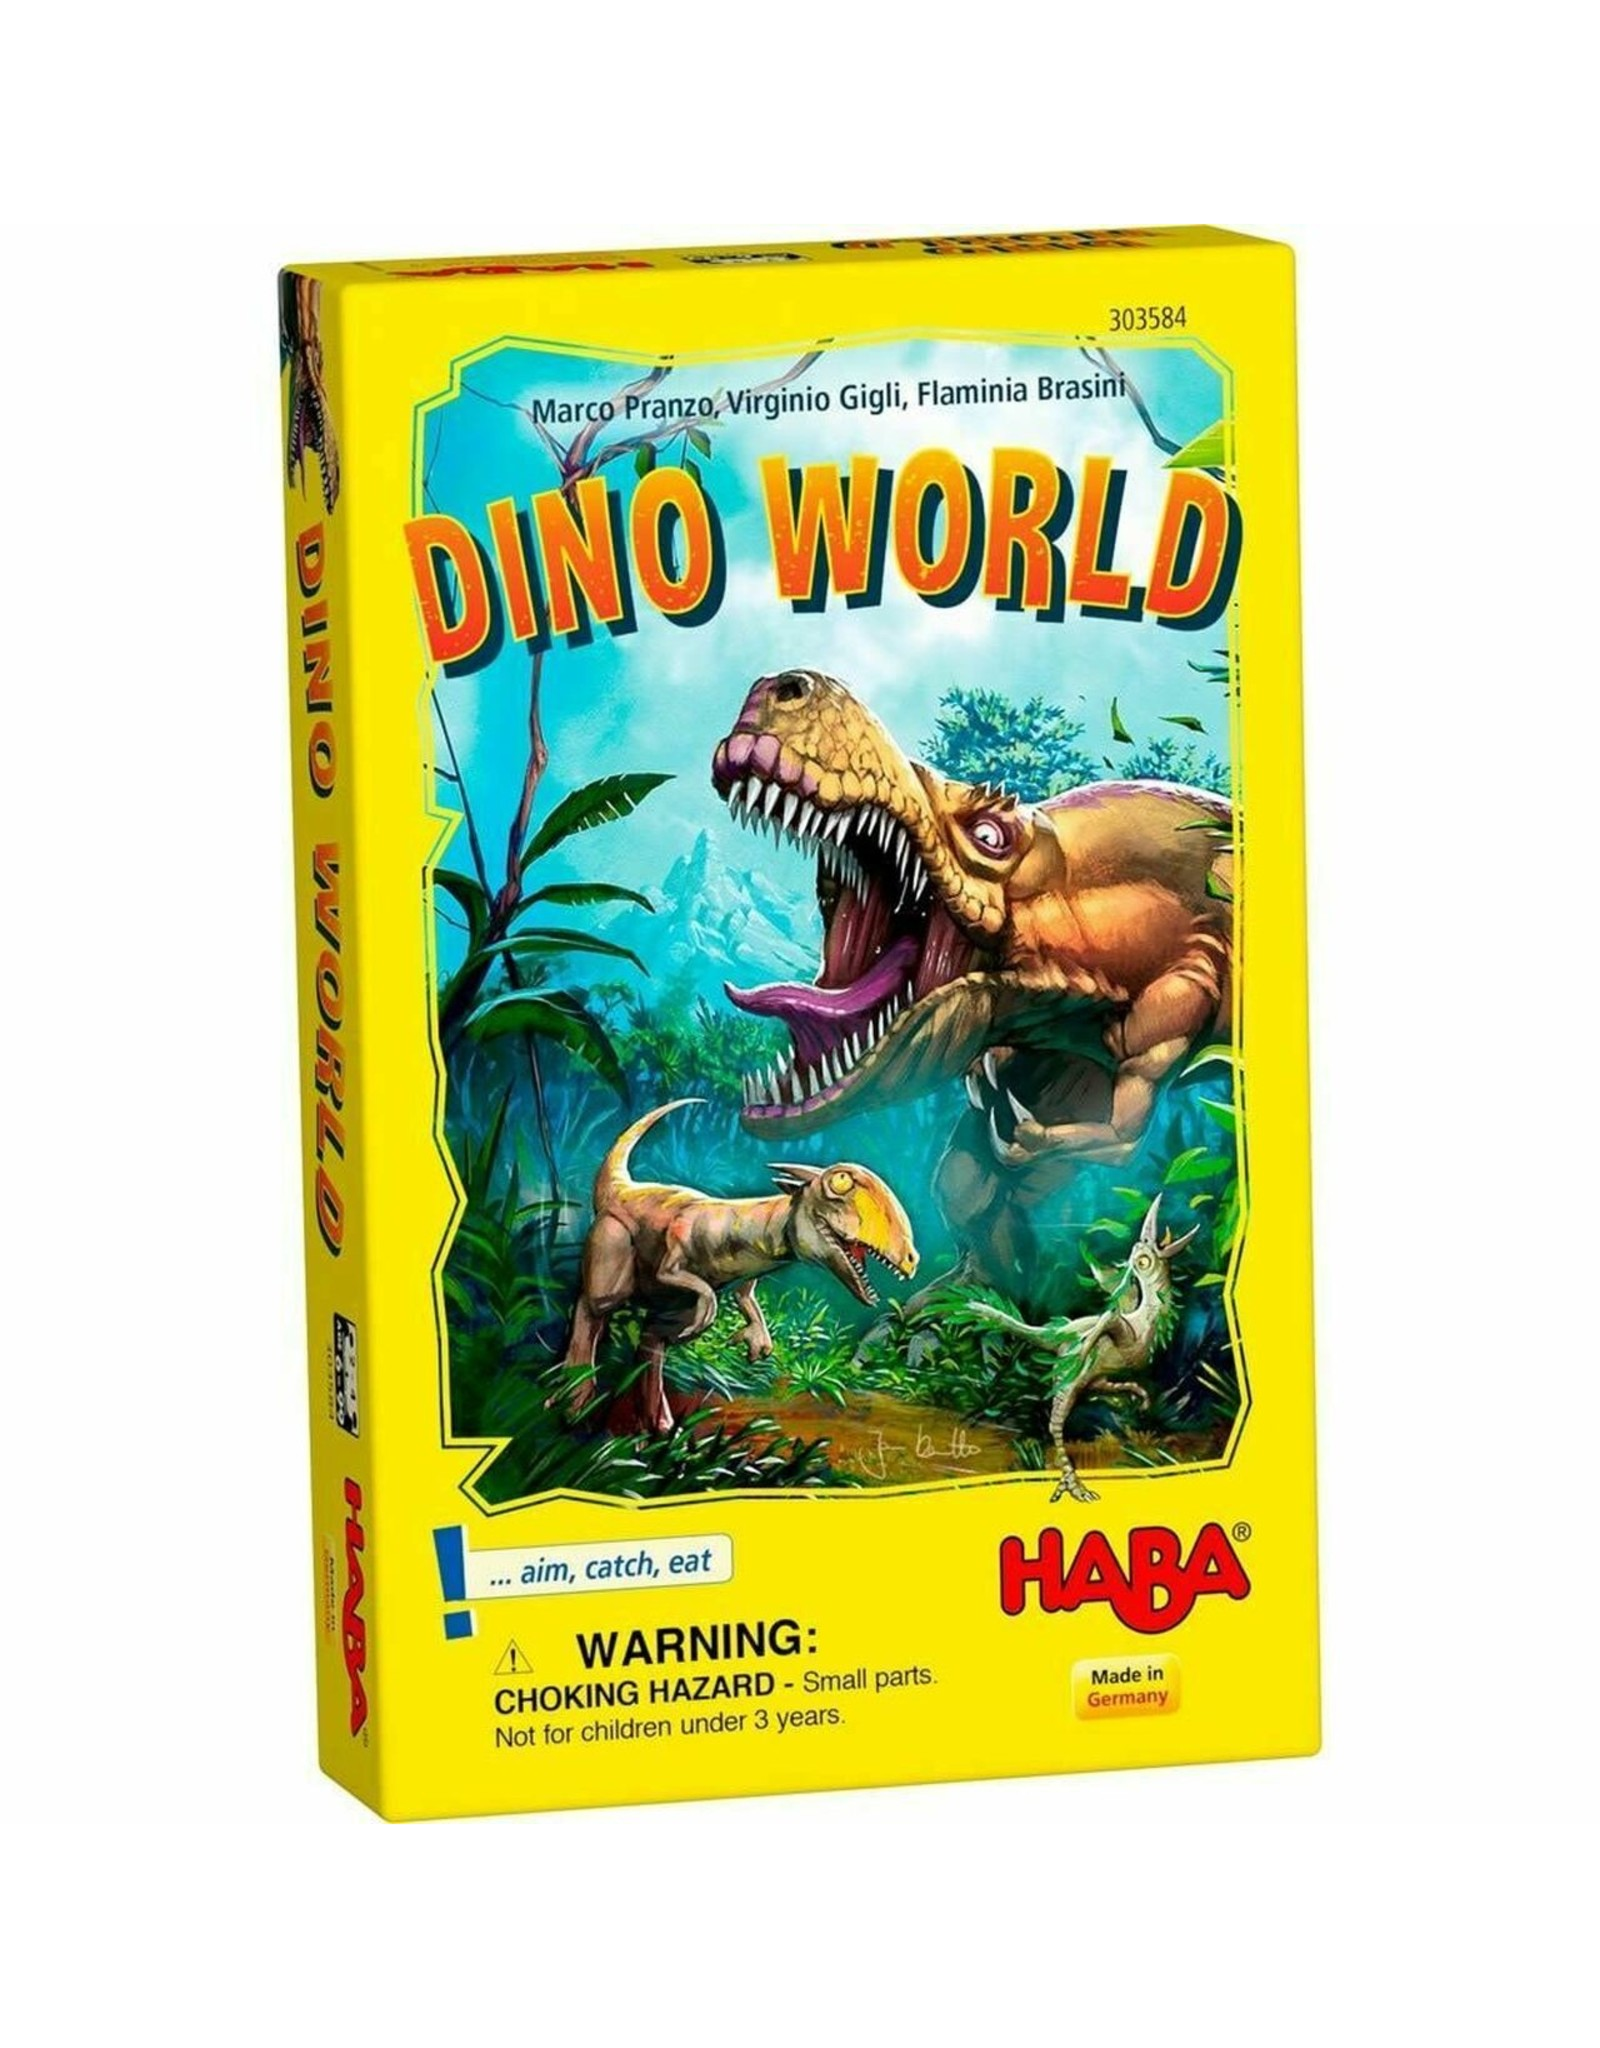 HABA GAMES DINO WORLD HABA GAME